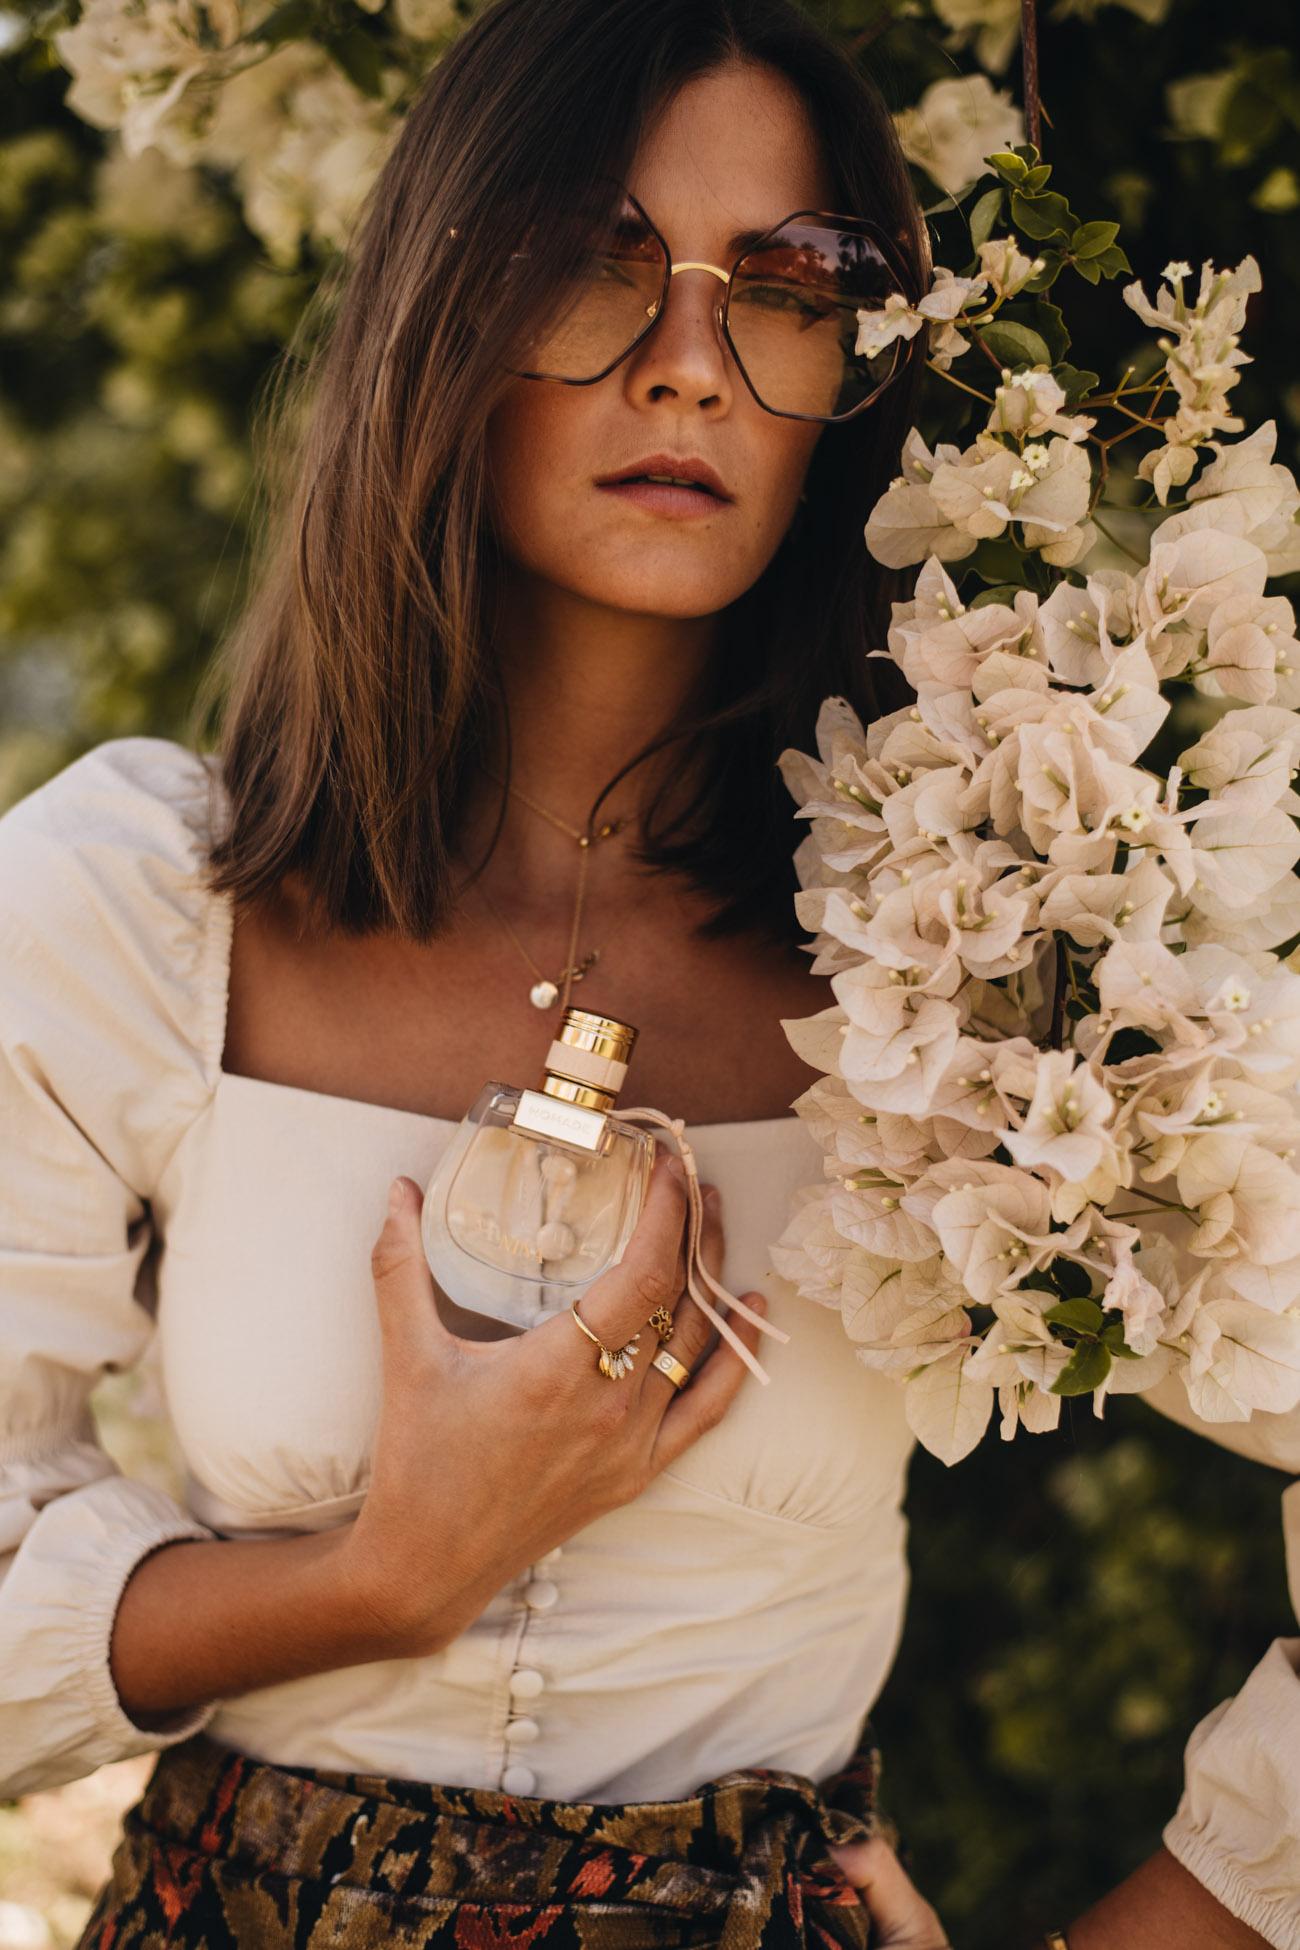 Parfum Trends Sommerdüfte 2019